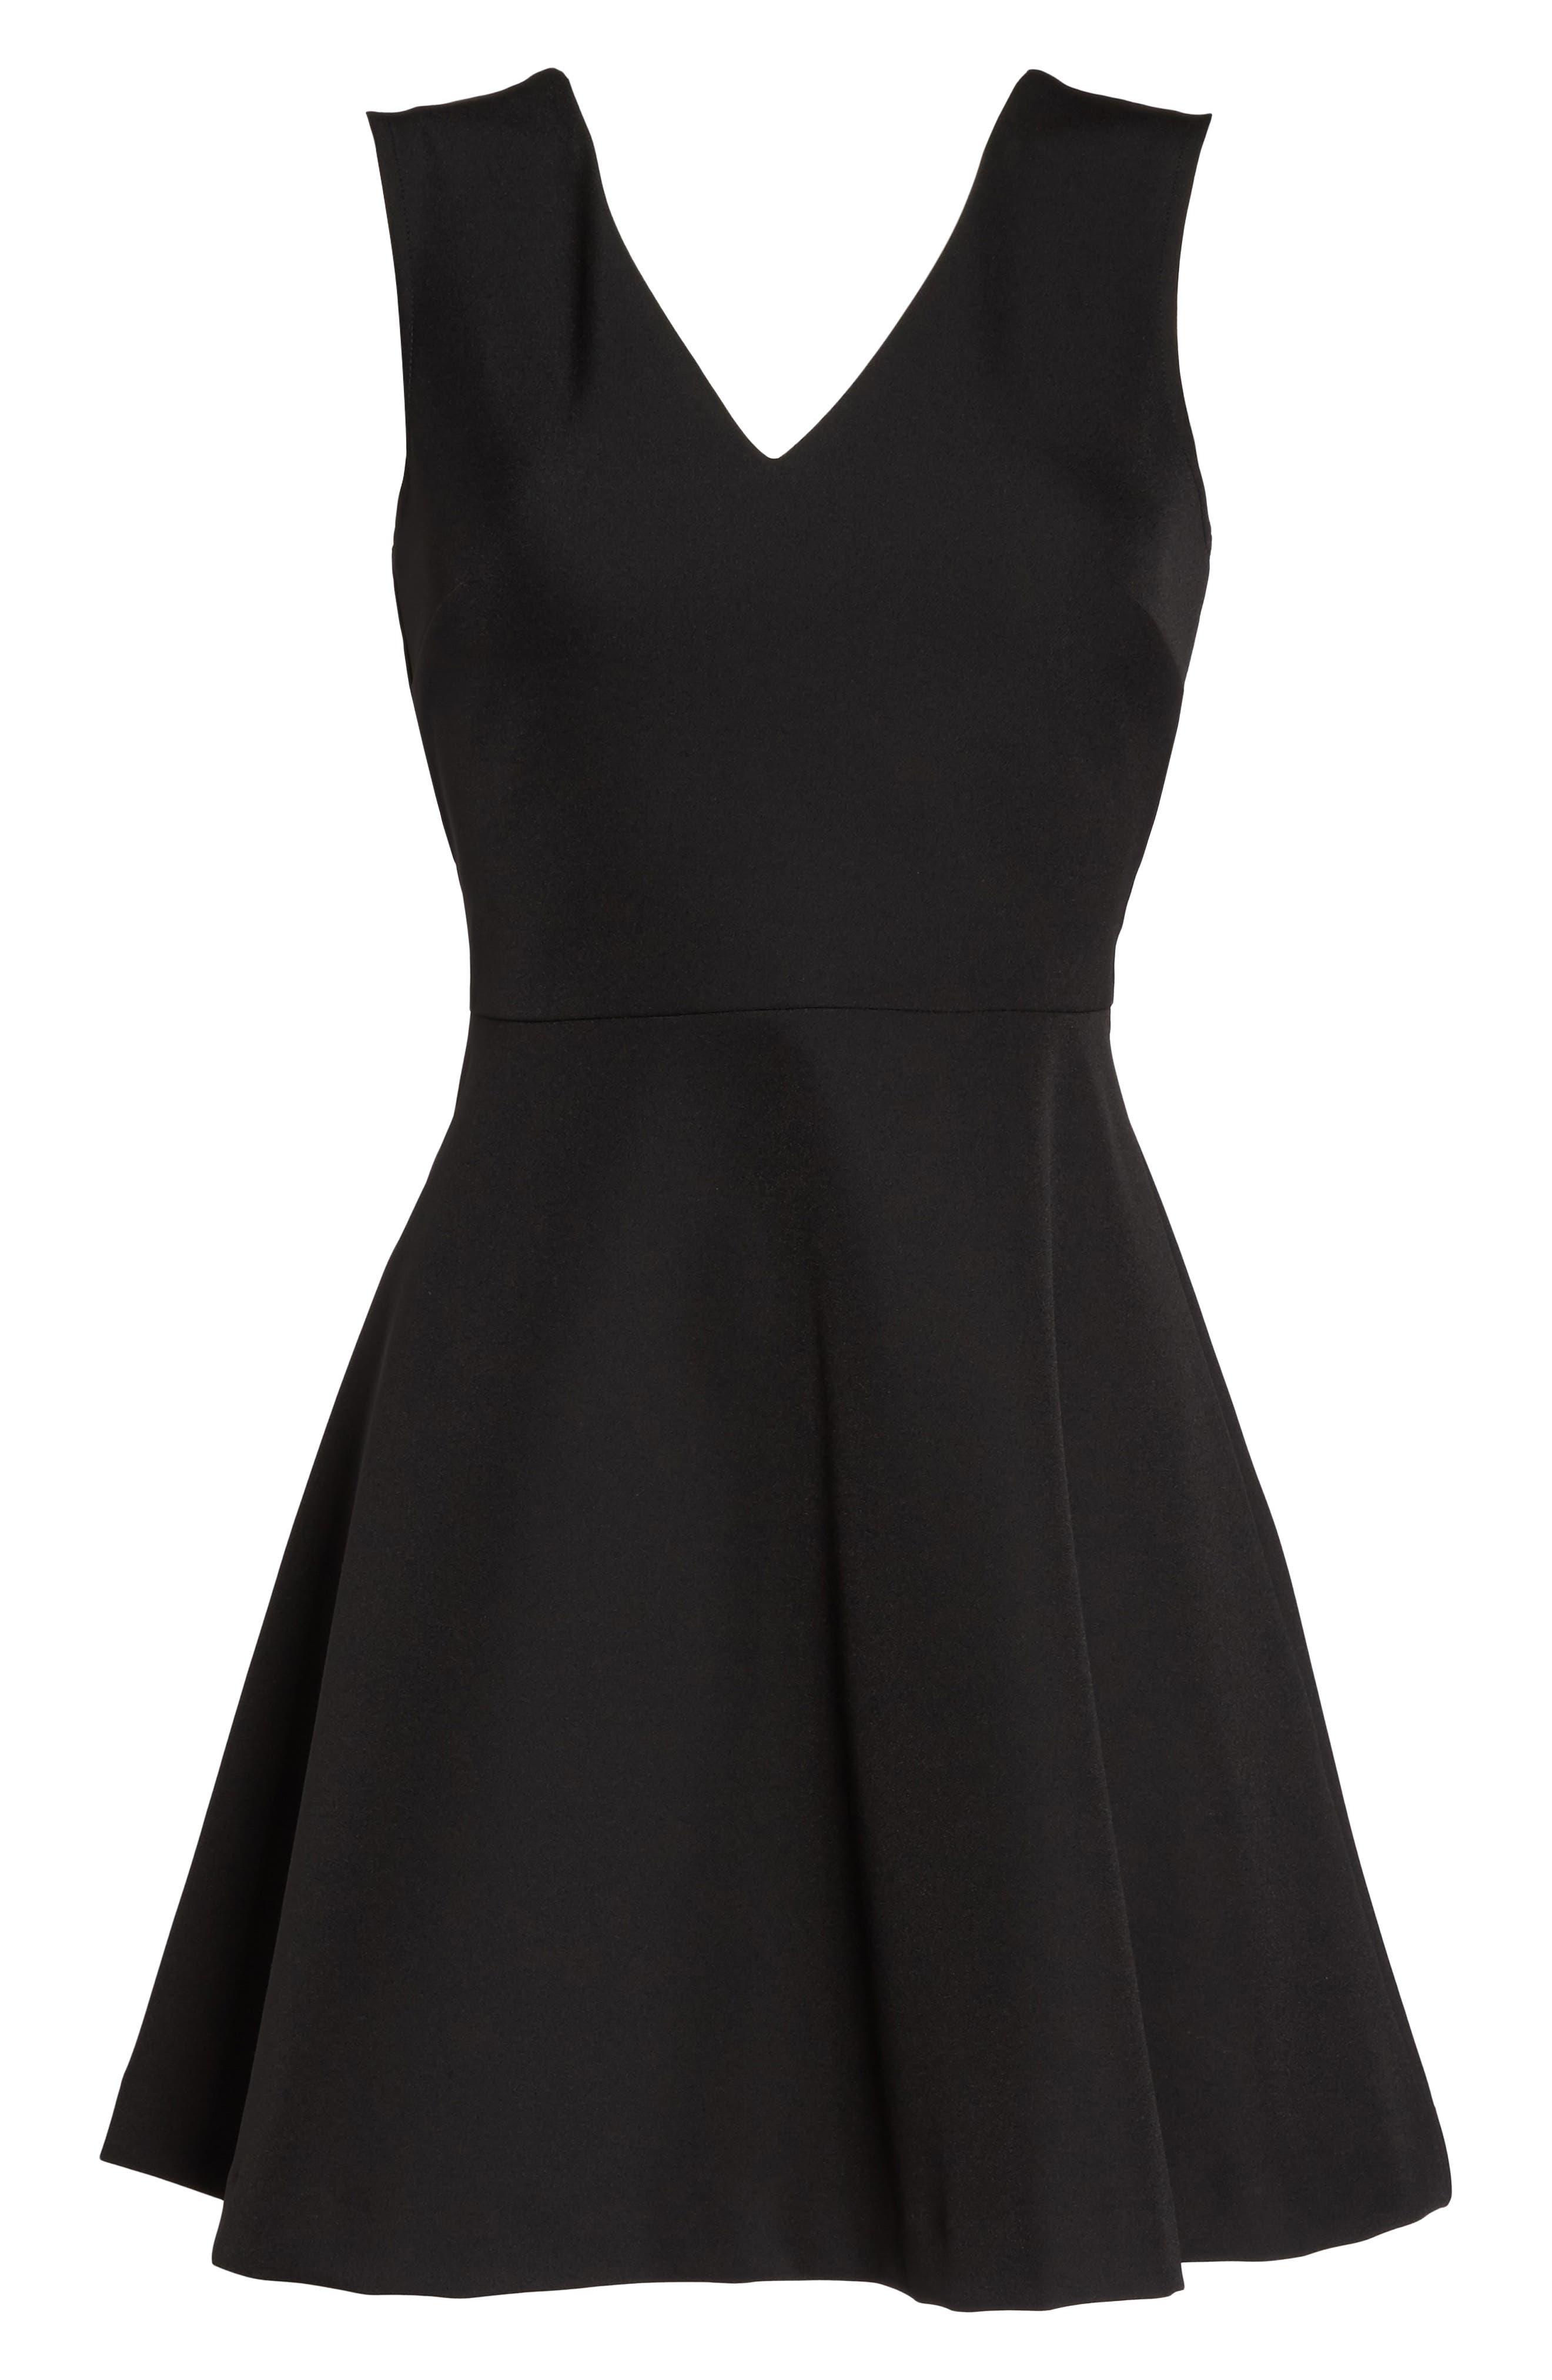 Bianca Back Cutout Fit & Flare Dress,                             Alternate thumbnail 7, color,                             001